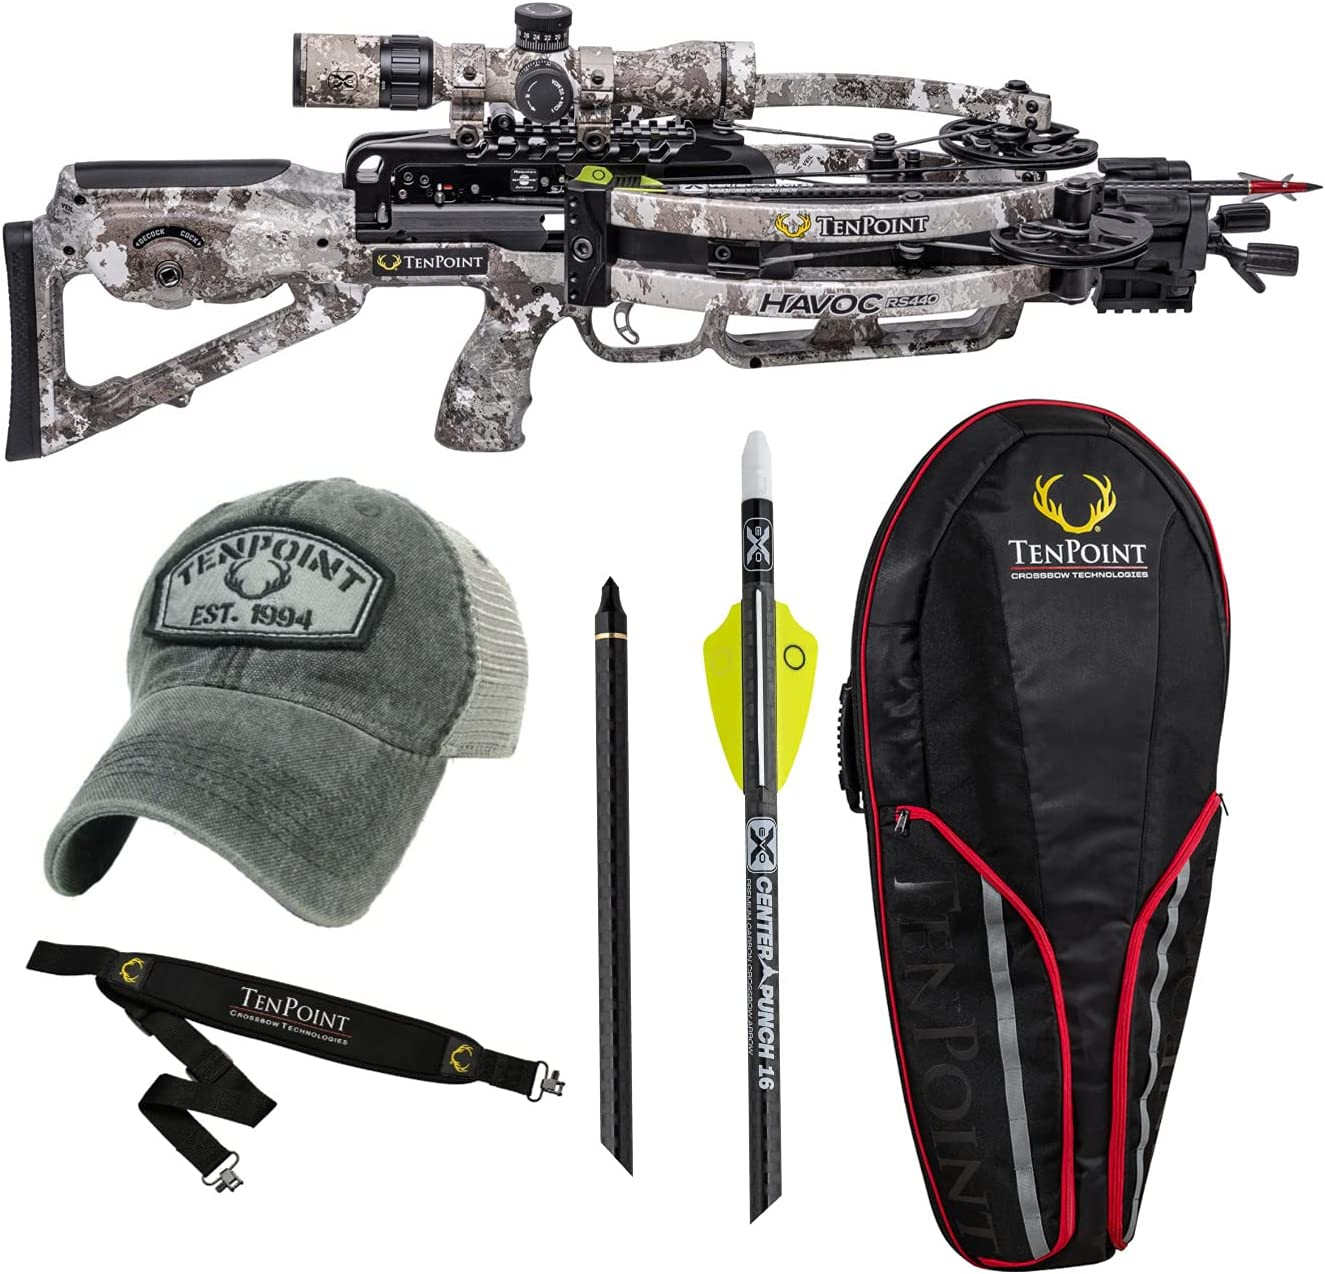 TenPoint Havoc Max 85% OFF RS440 Crossbow Alpine Camo Bundle 5 Essentials free